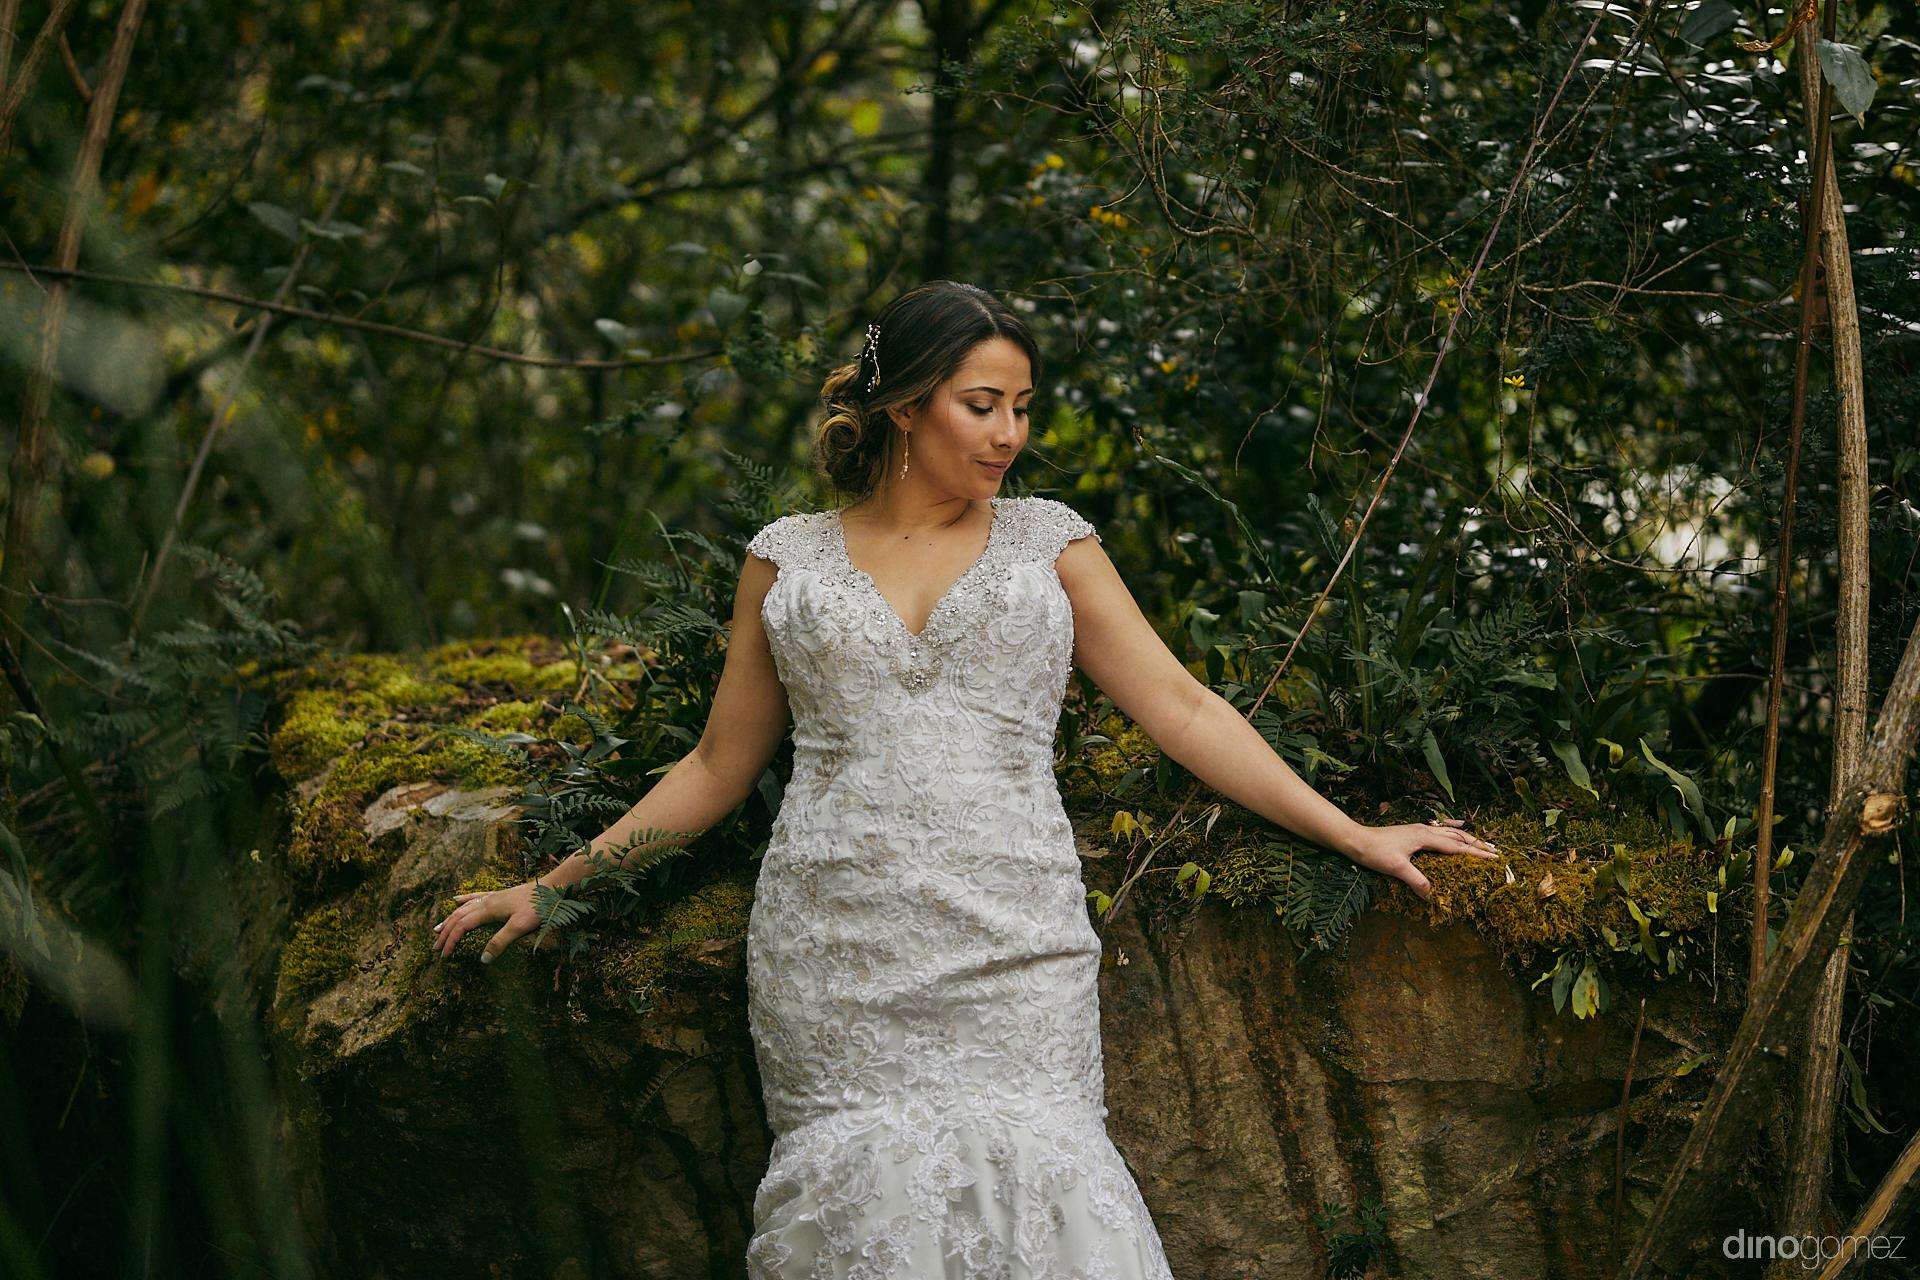 016 - Diy Budget Destination Weddings Can Be Prety Too!